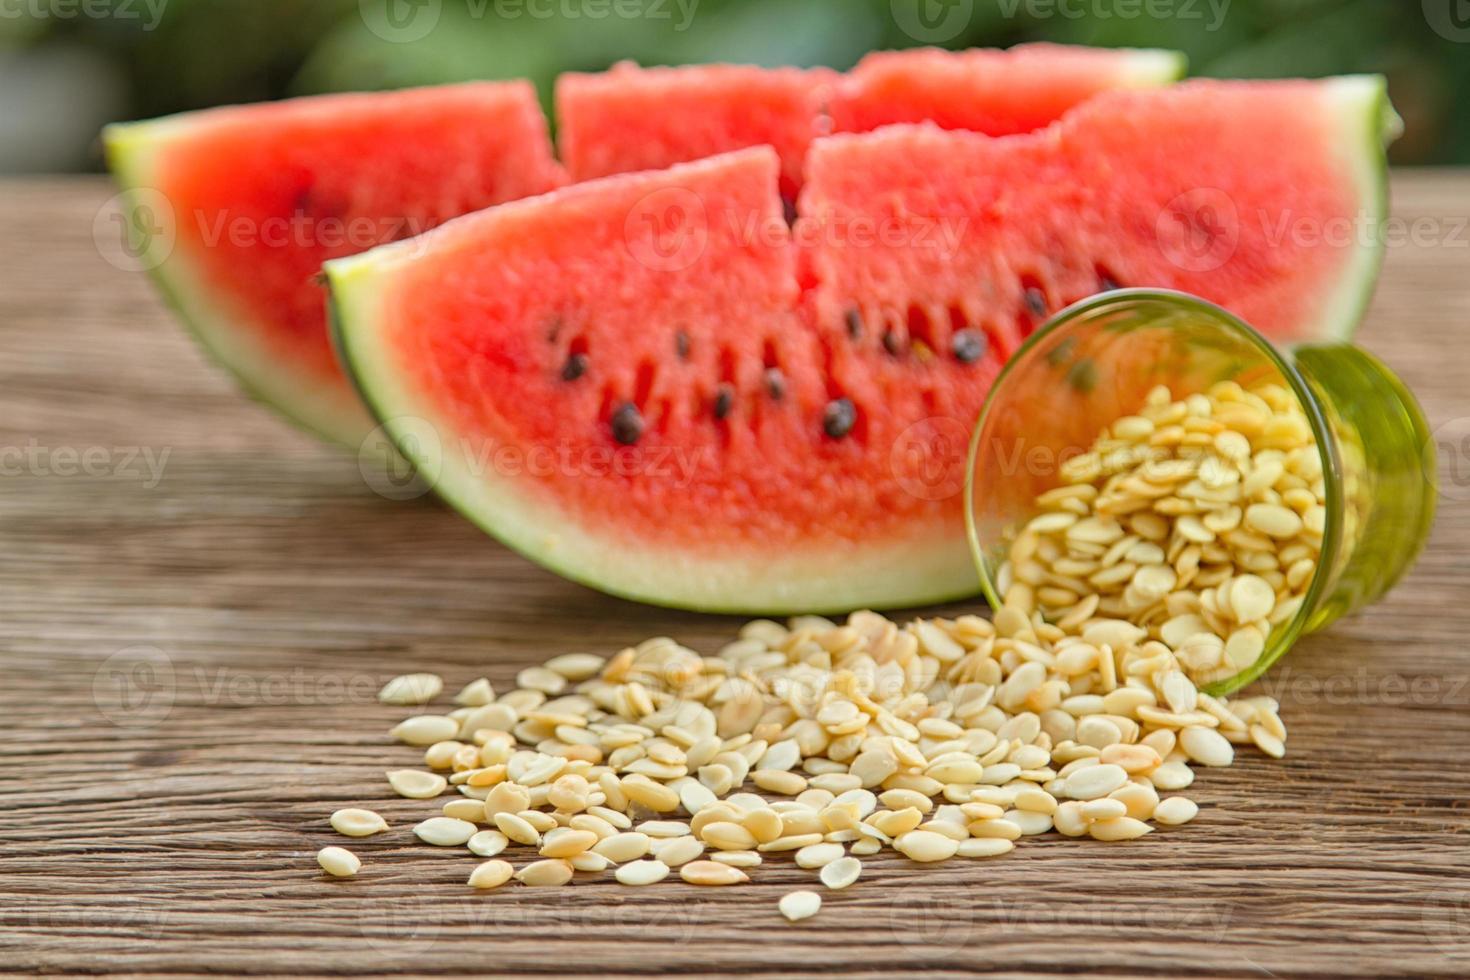 sementes de melancia sem casca foto